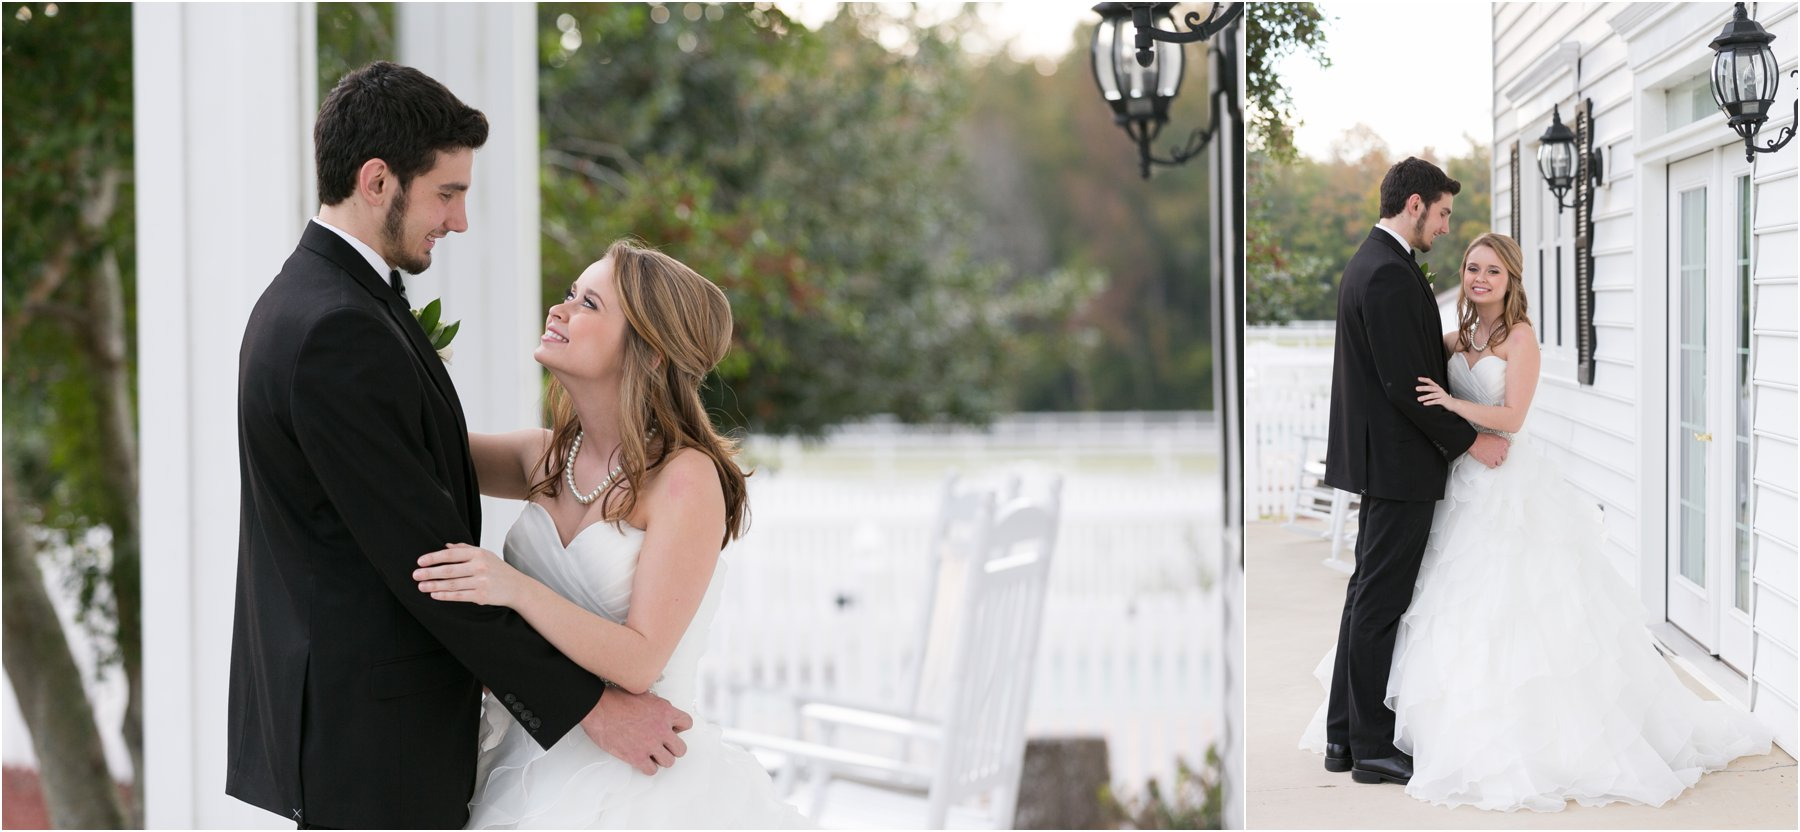 Holly_Ridge_Manor_Wedding_Photography_Jessica_Ryan_Photography_virginia_virginia_beach_0260